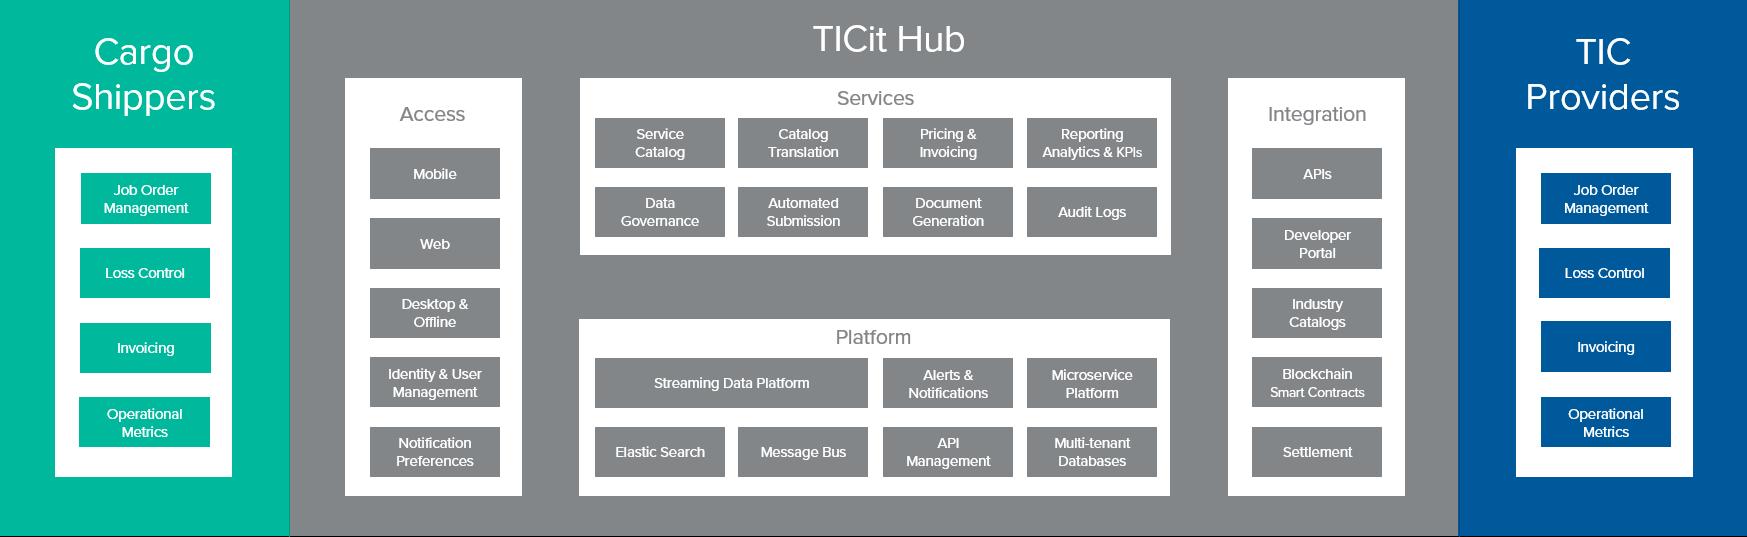 TICit Hub Maritecture_2018.png